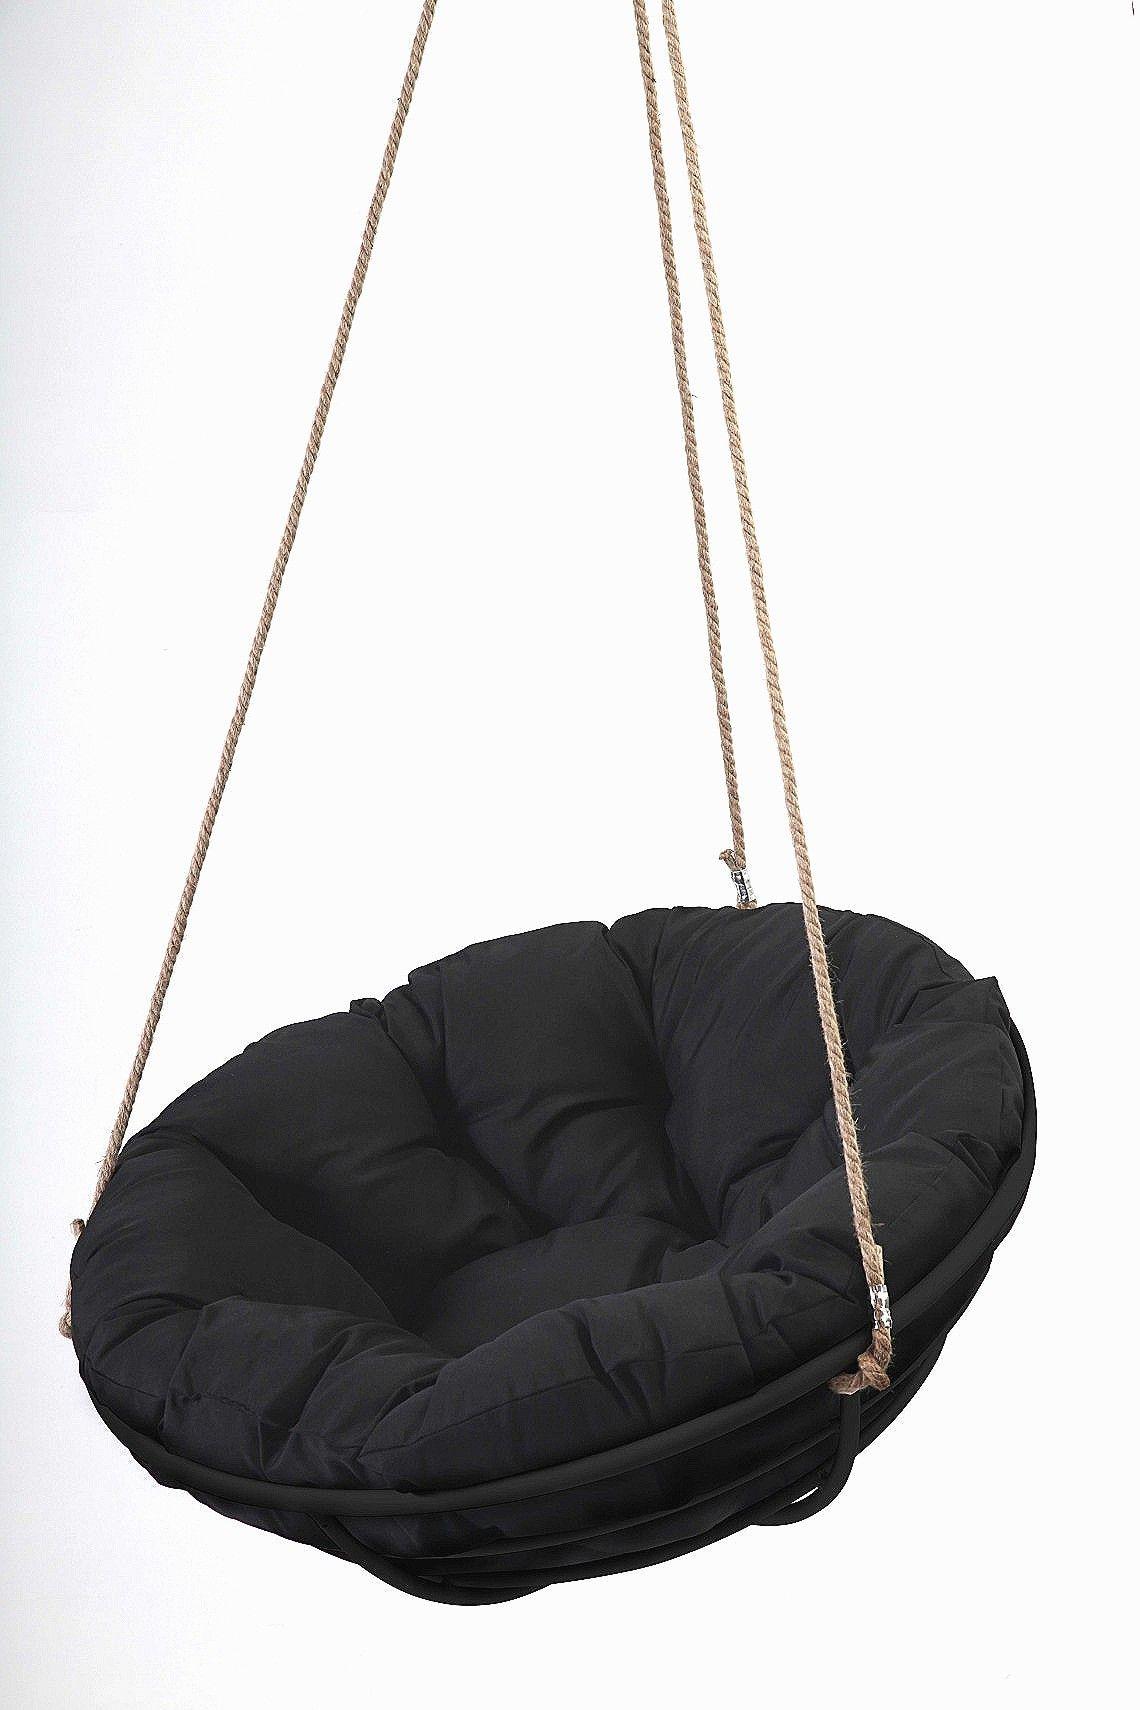 Rattan Hangesessel Mit Gestell Indoor Hangesessel Ei Formige Stuhl